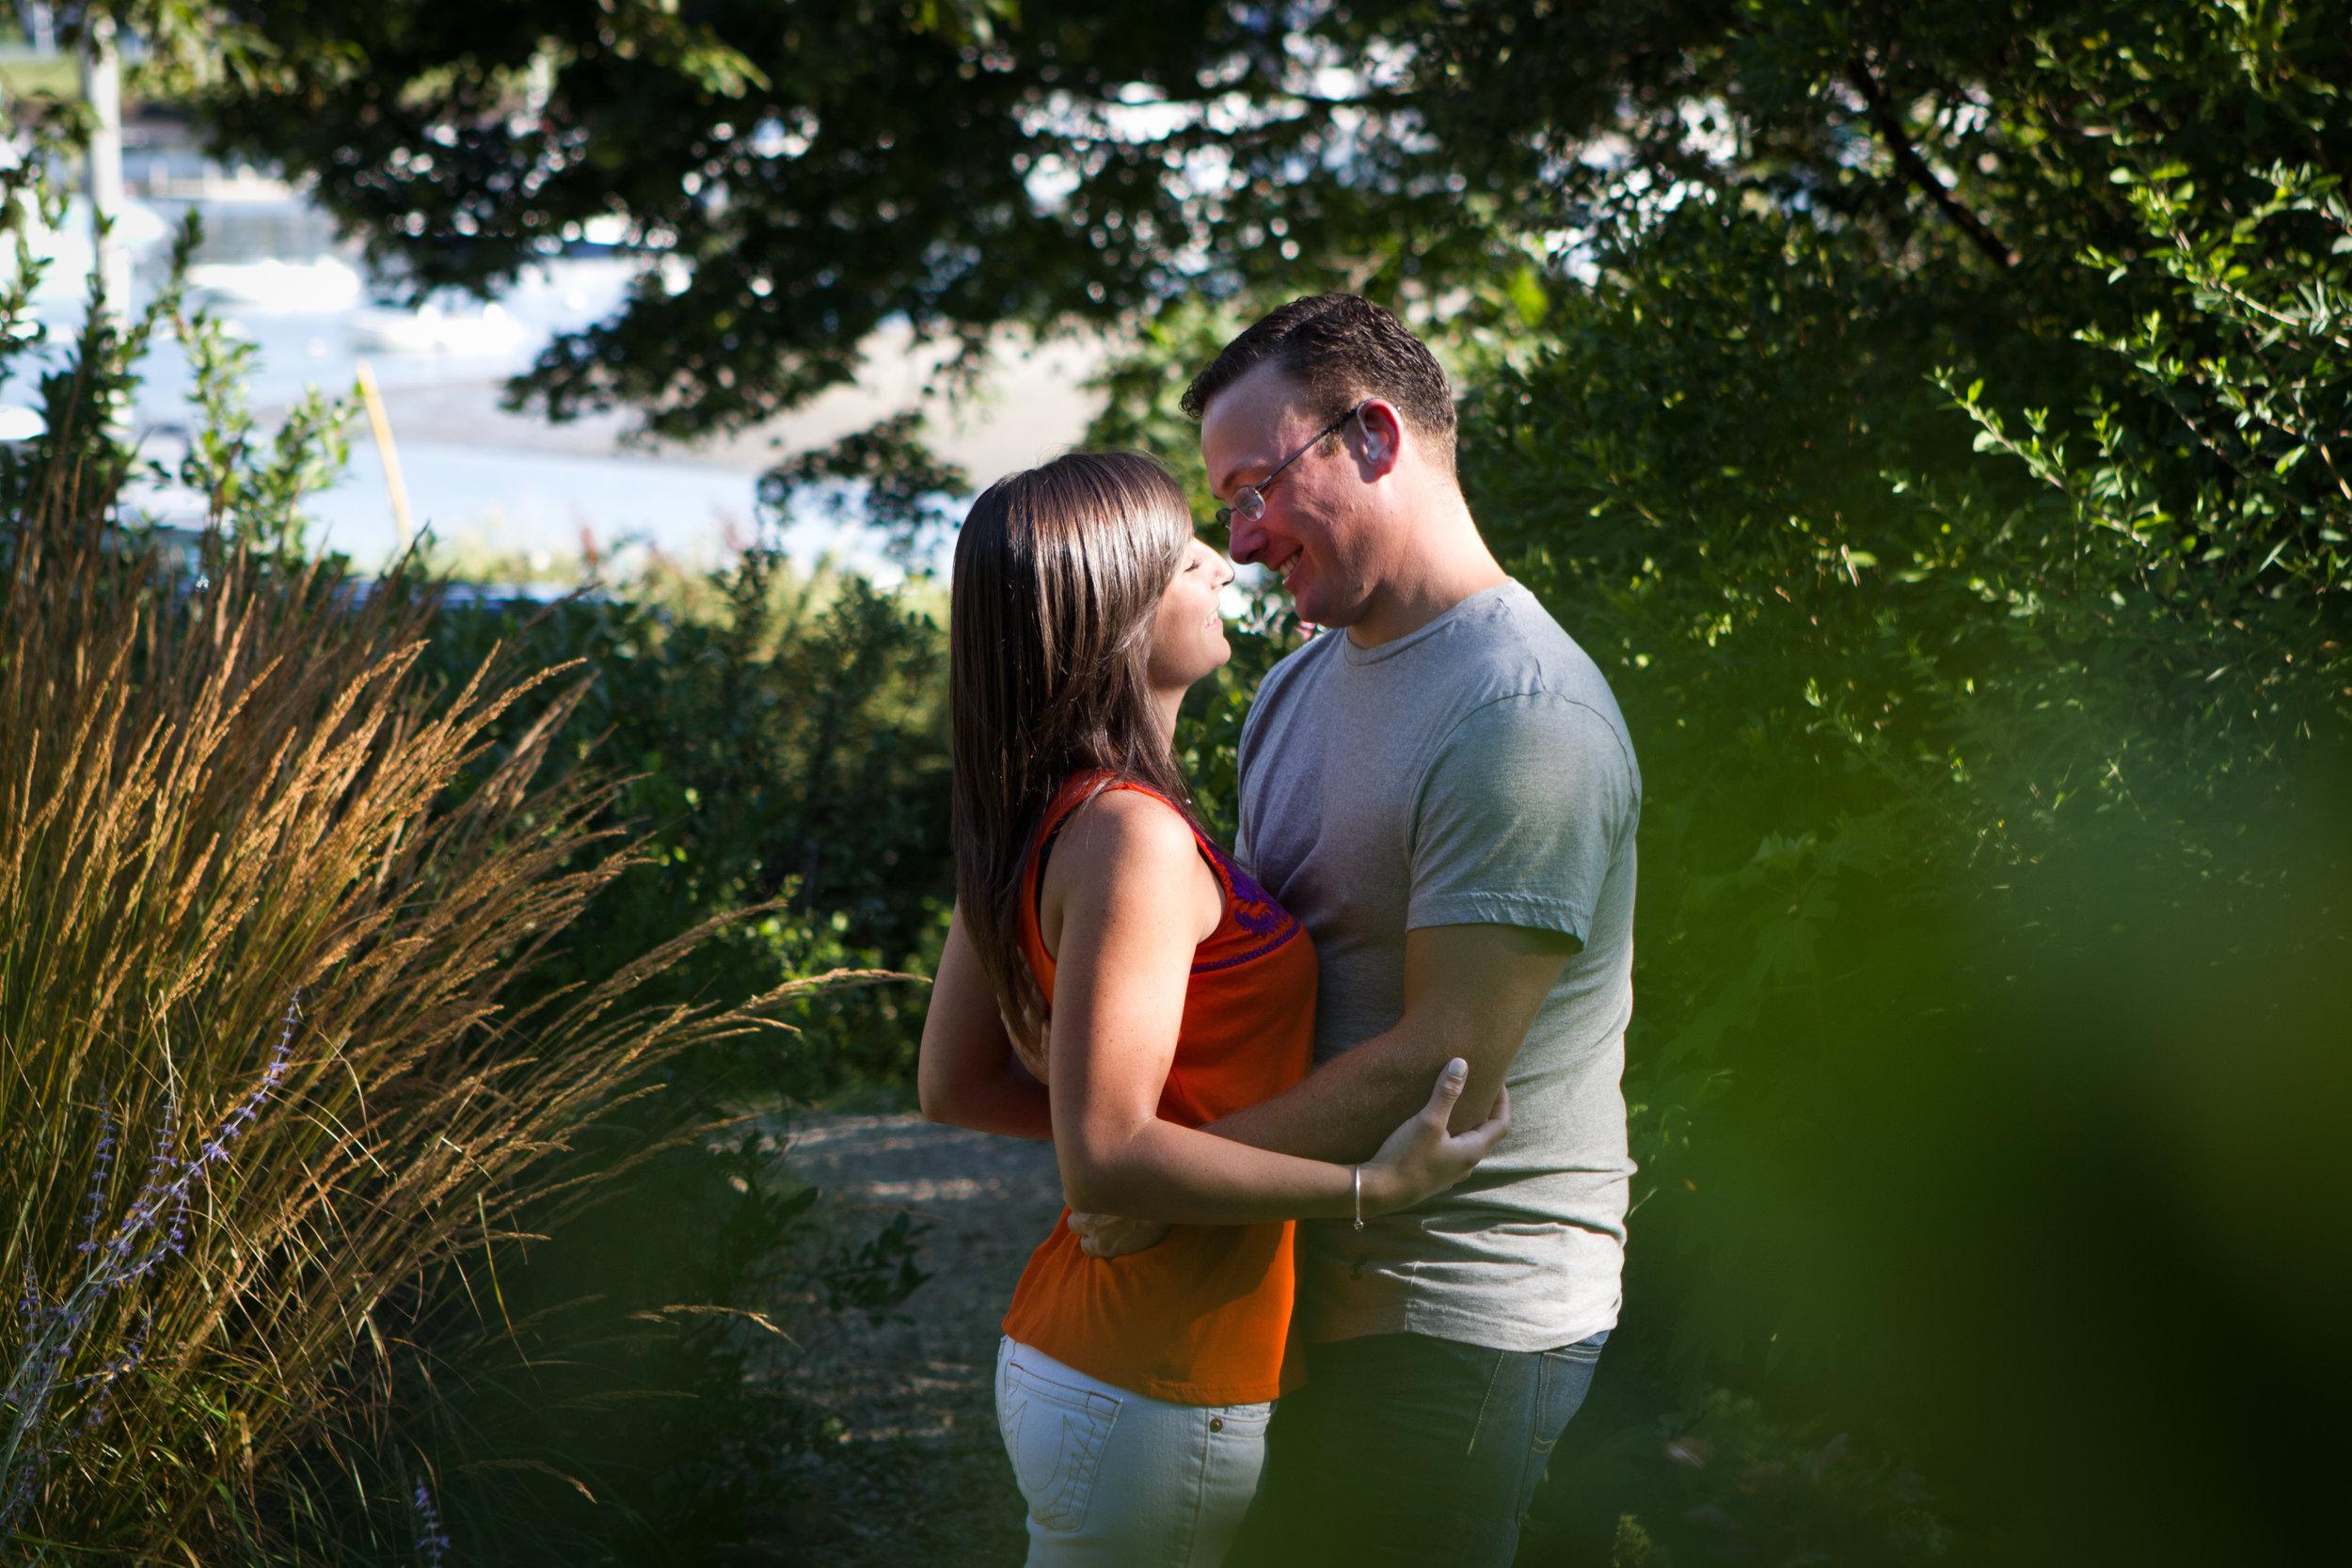 Erin and Mike Sandy Beach Cohasset Harbor South Shore Massachusetts Engagement Photographer Shannon Sorensen Photography